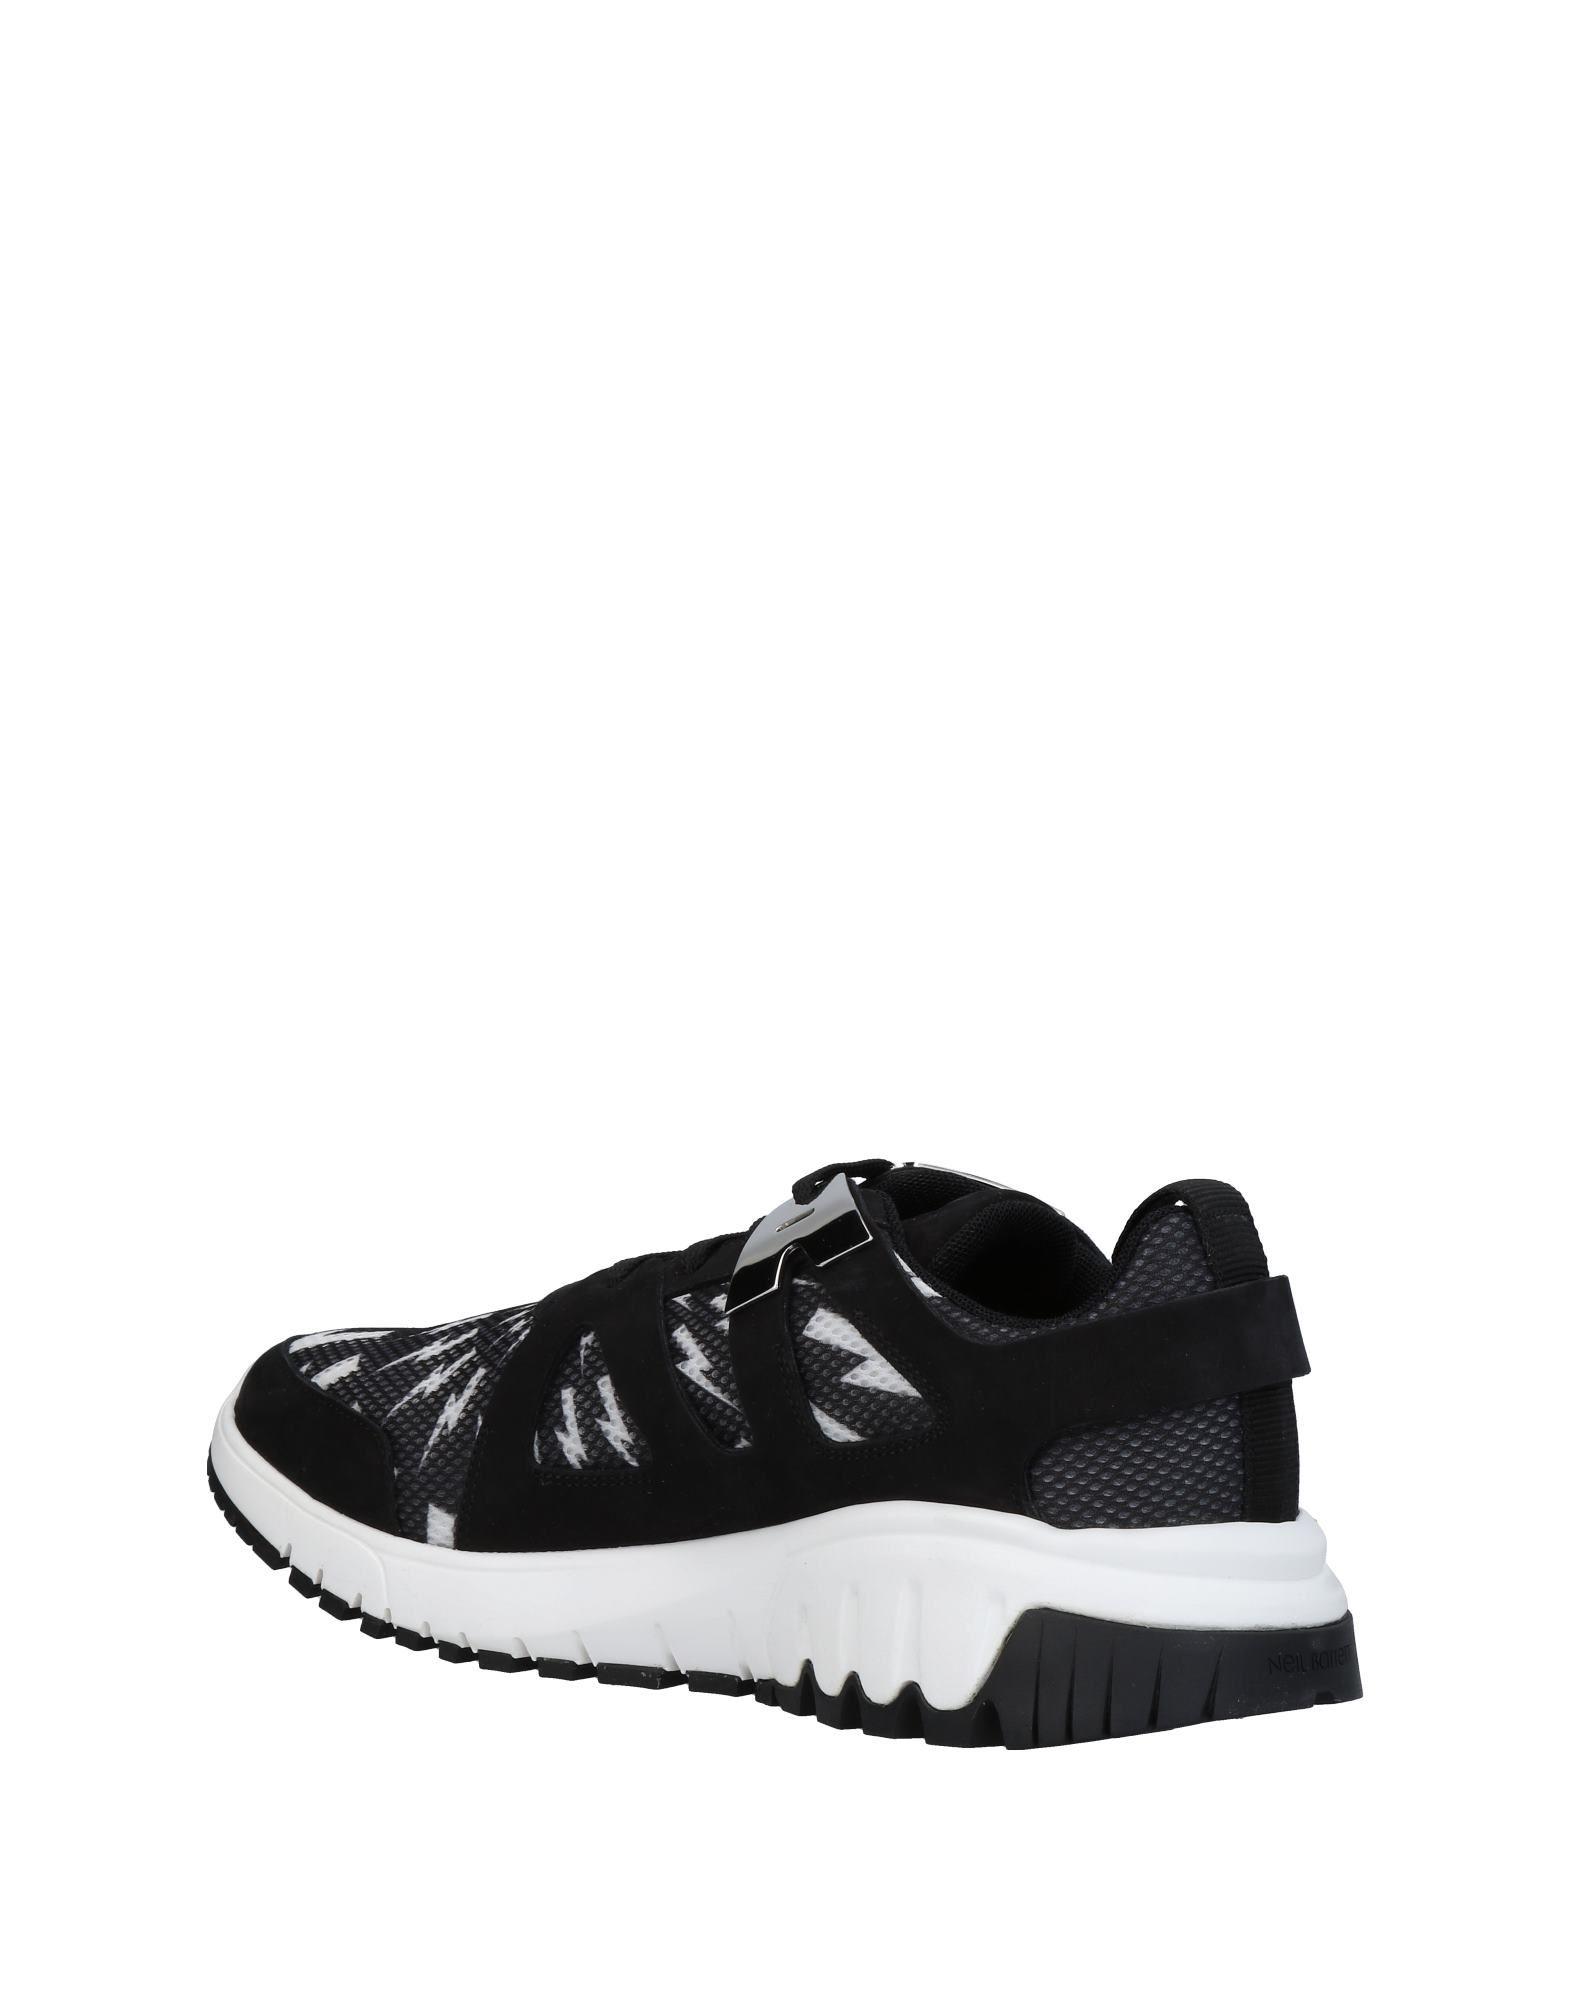 Neil 11441468IW Barrett Sneakers Herren  11441468IW Neil Gute Qualität beliebte Schuhe 3c9e96